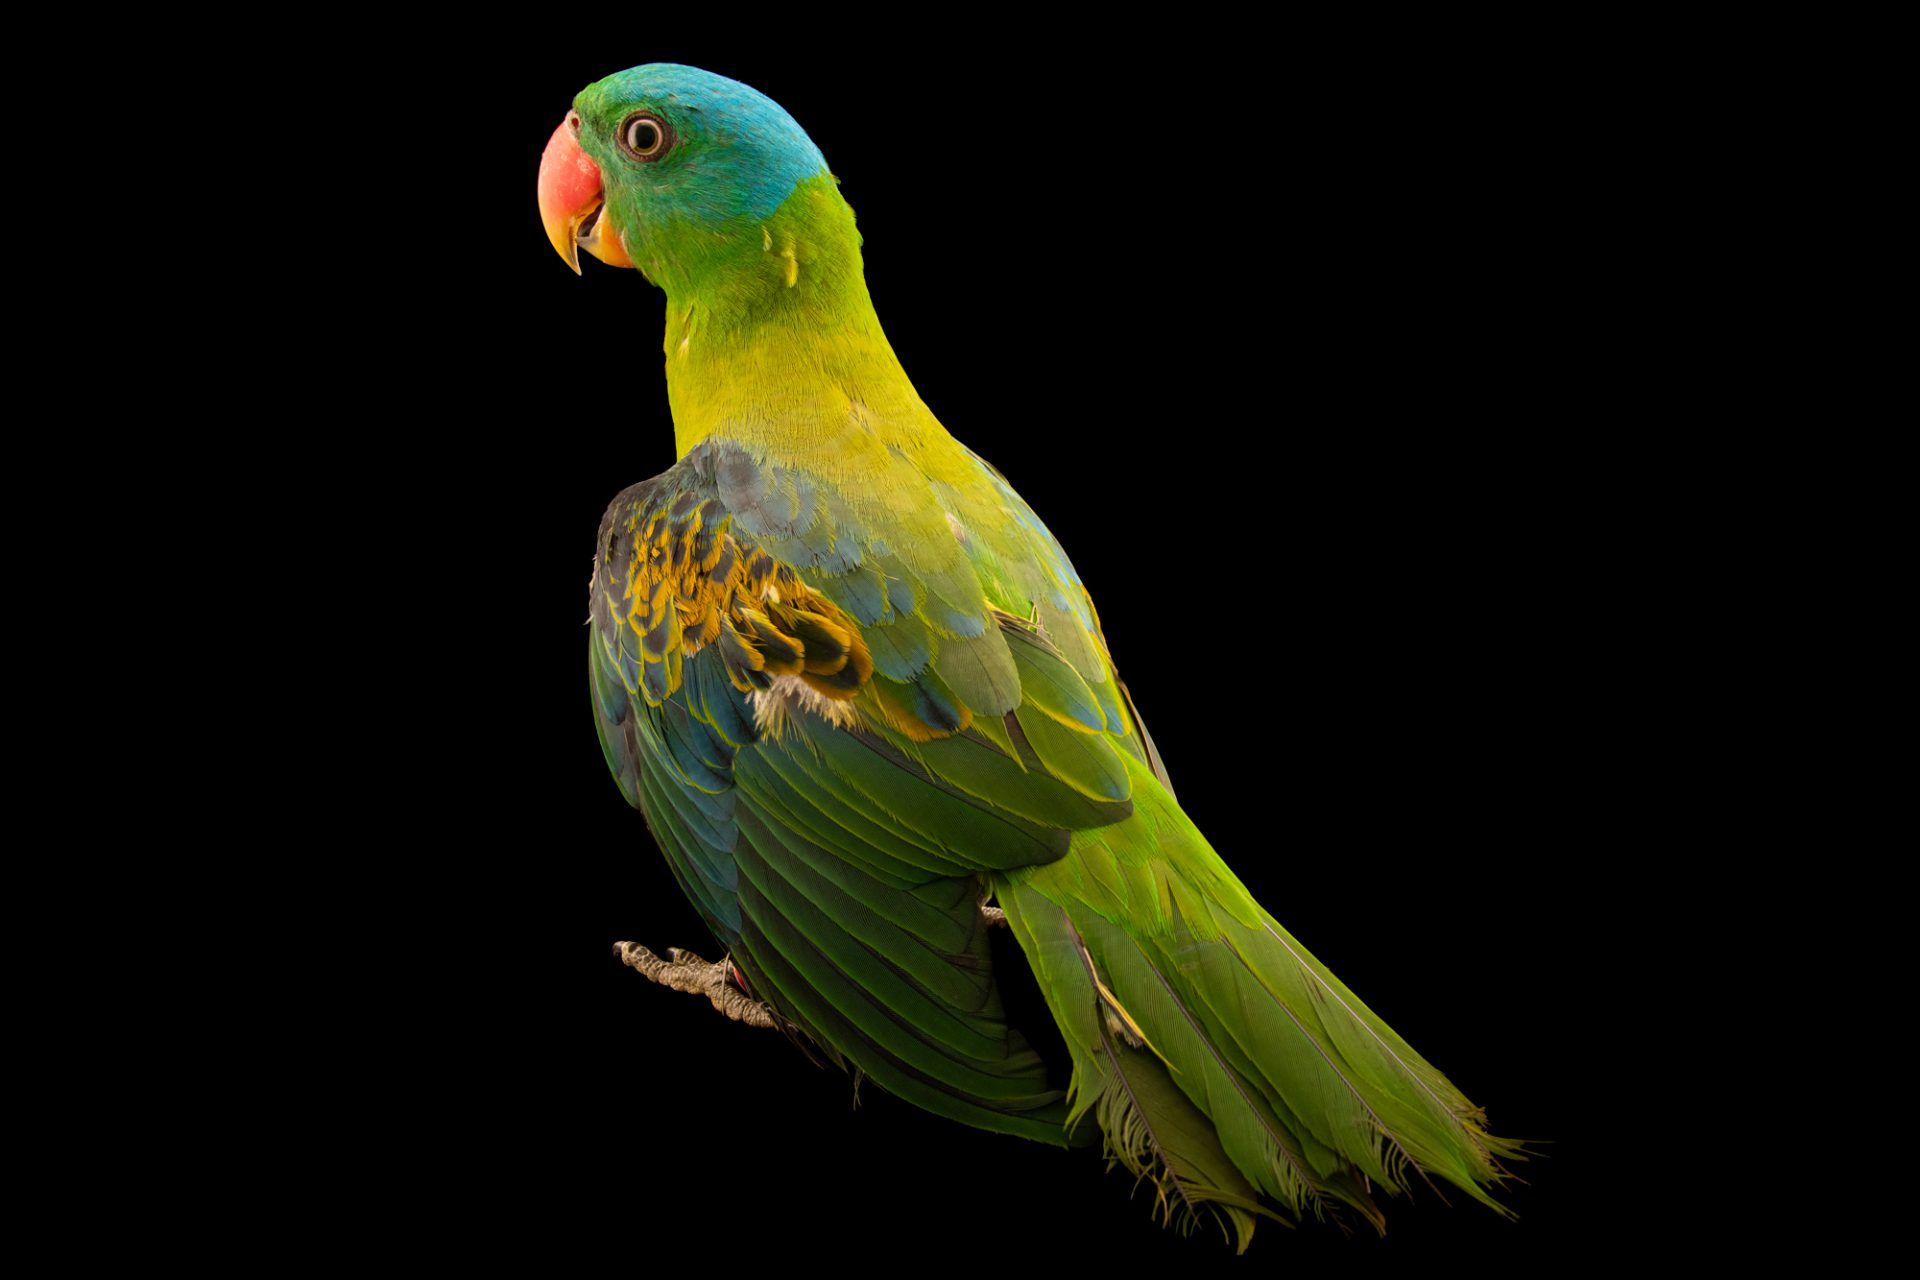 Photo: A blue-naped parrot, Tanygnathus lucionensis salvadorii, at Talarak Foundation.